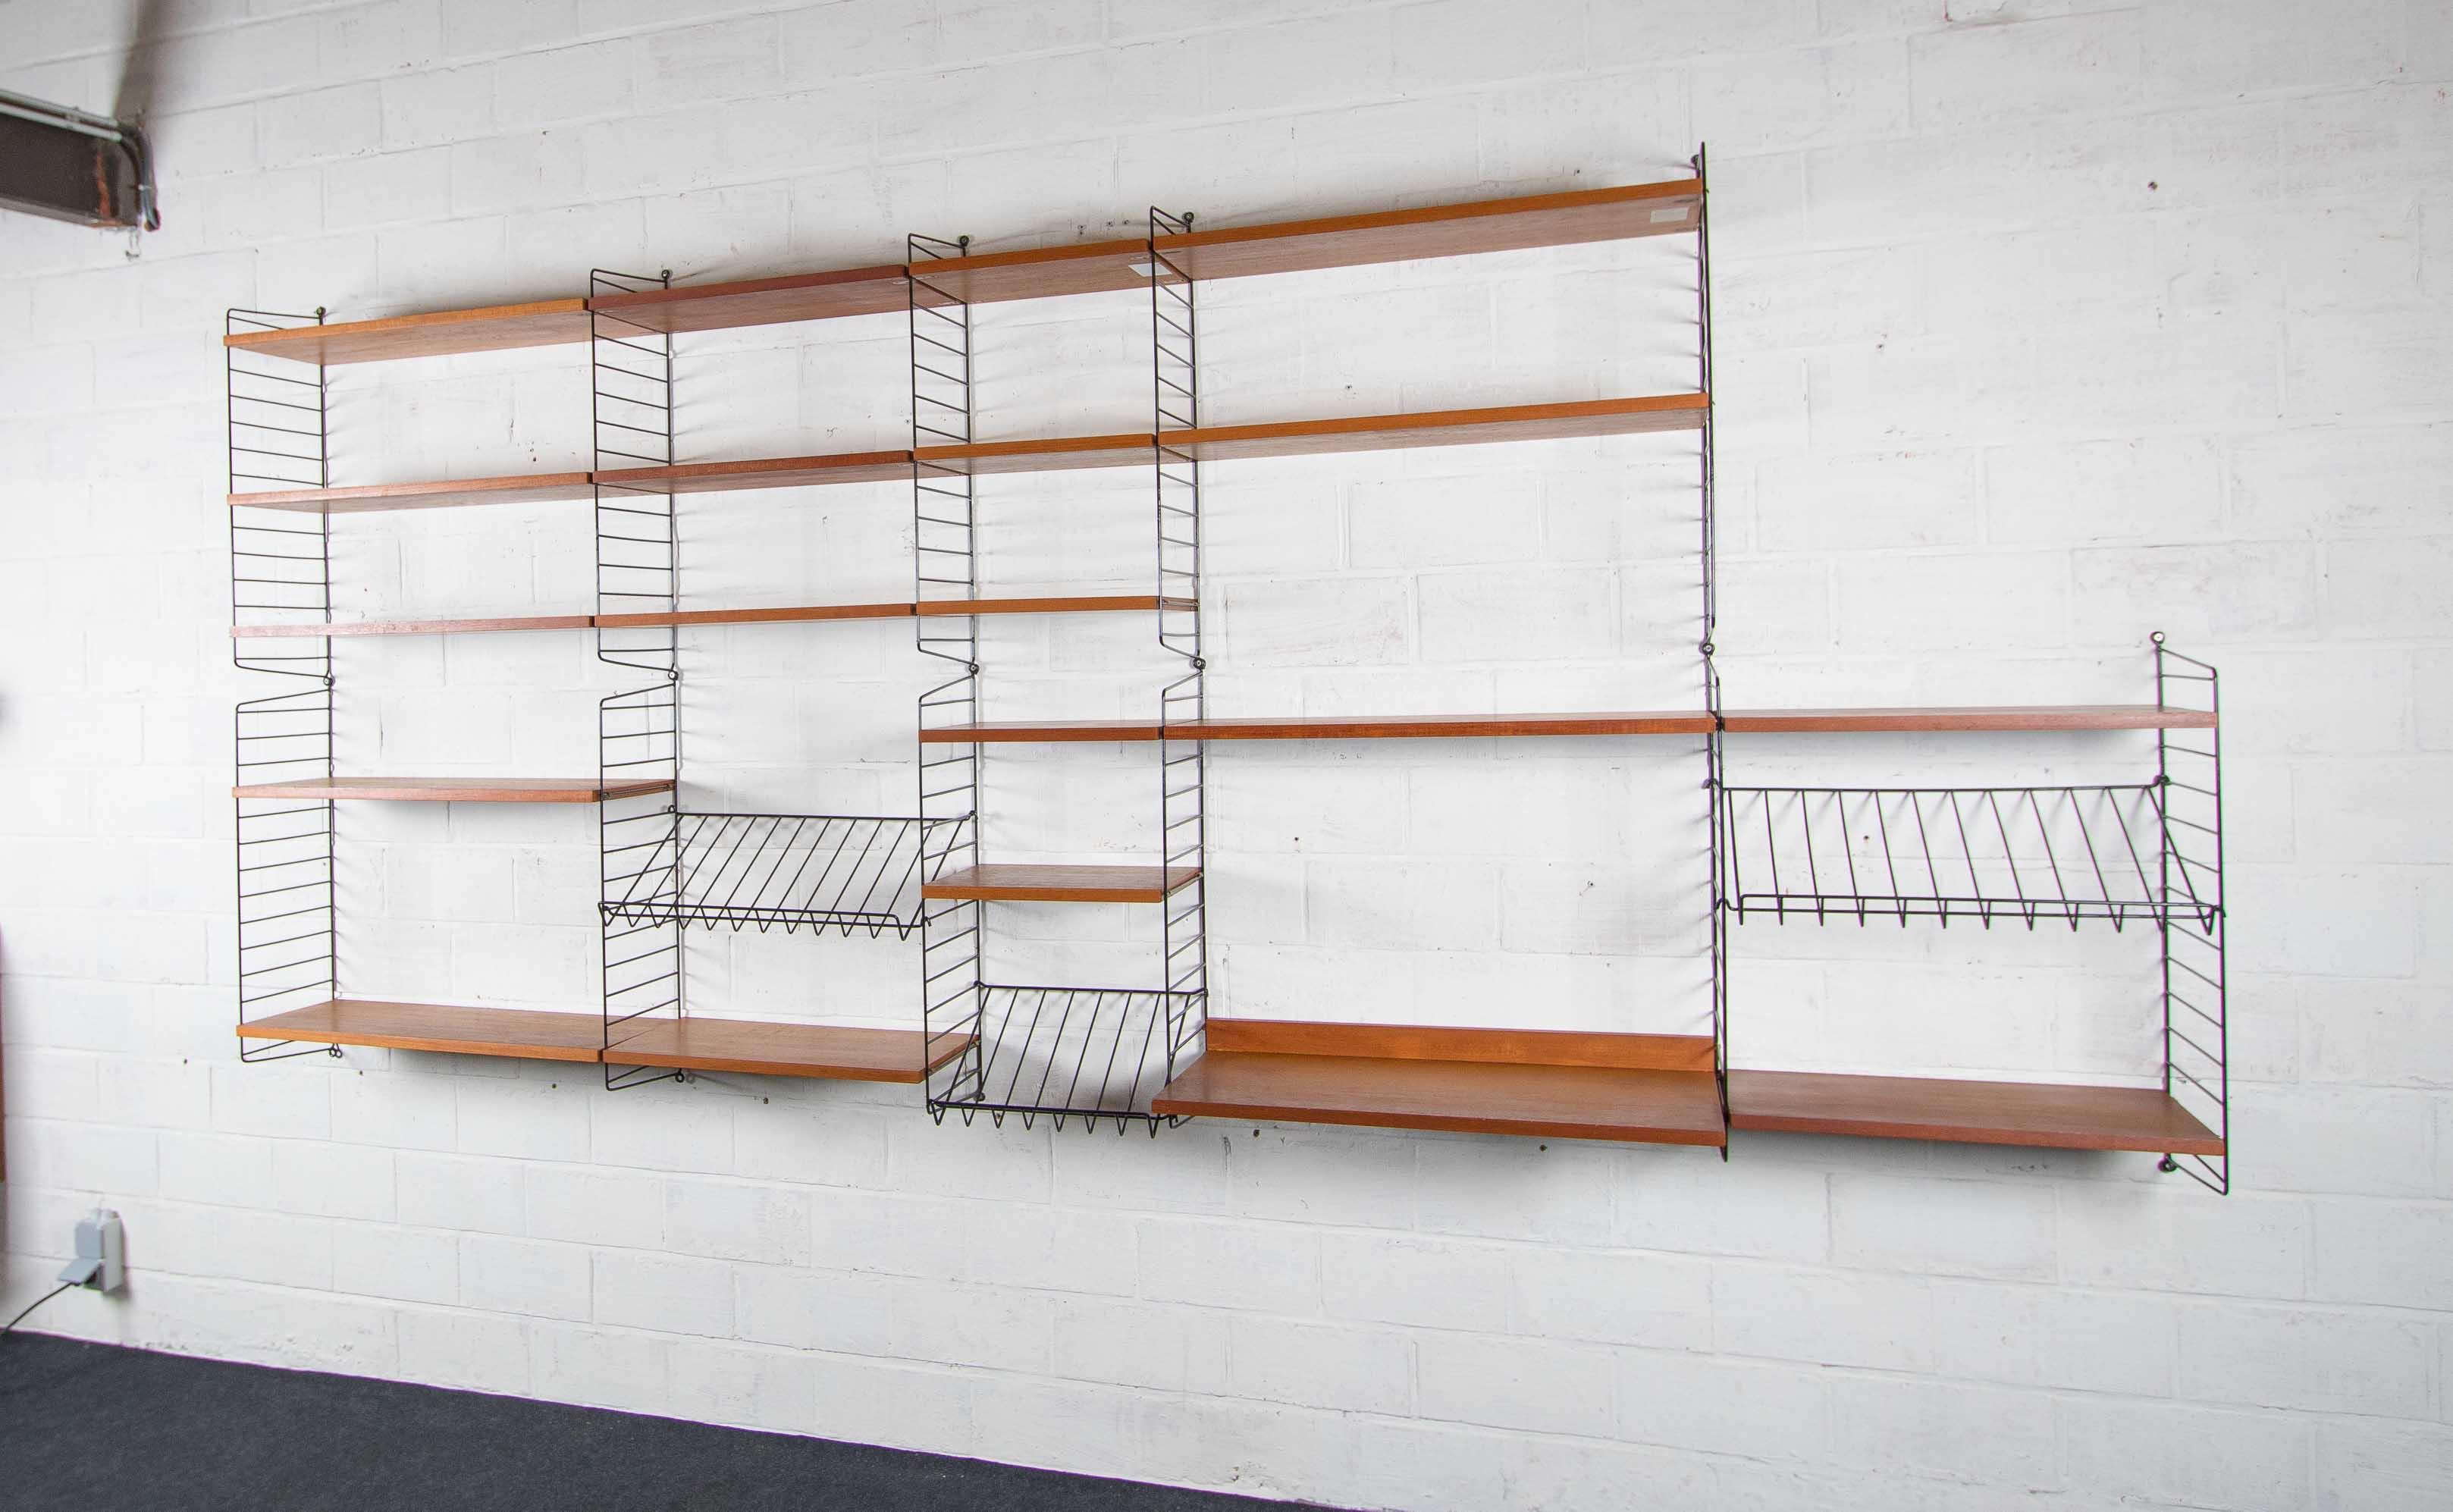 Lagre wall unit Stringthumbnail